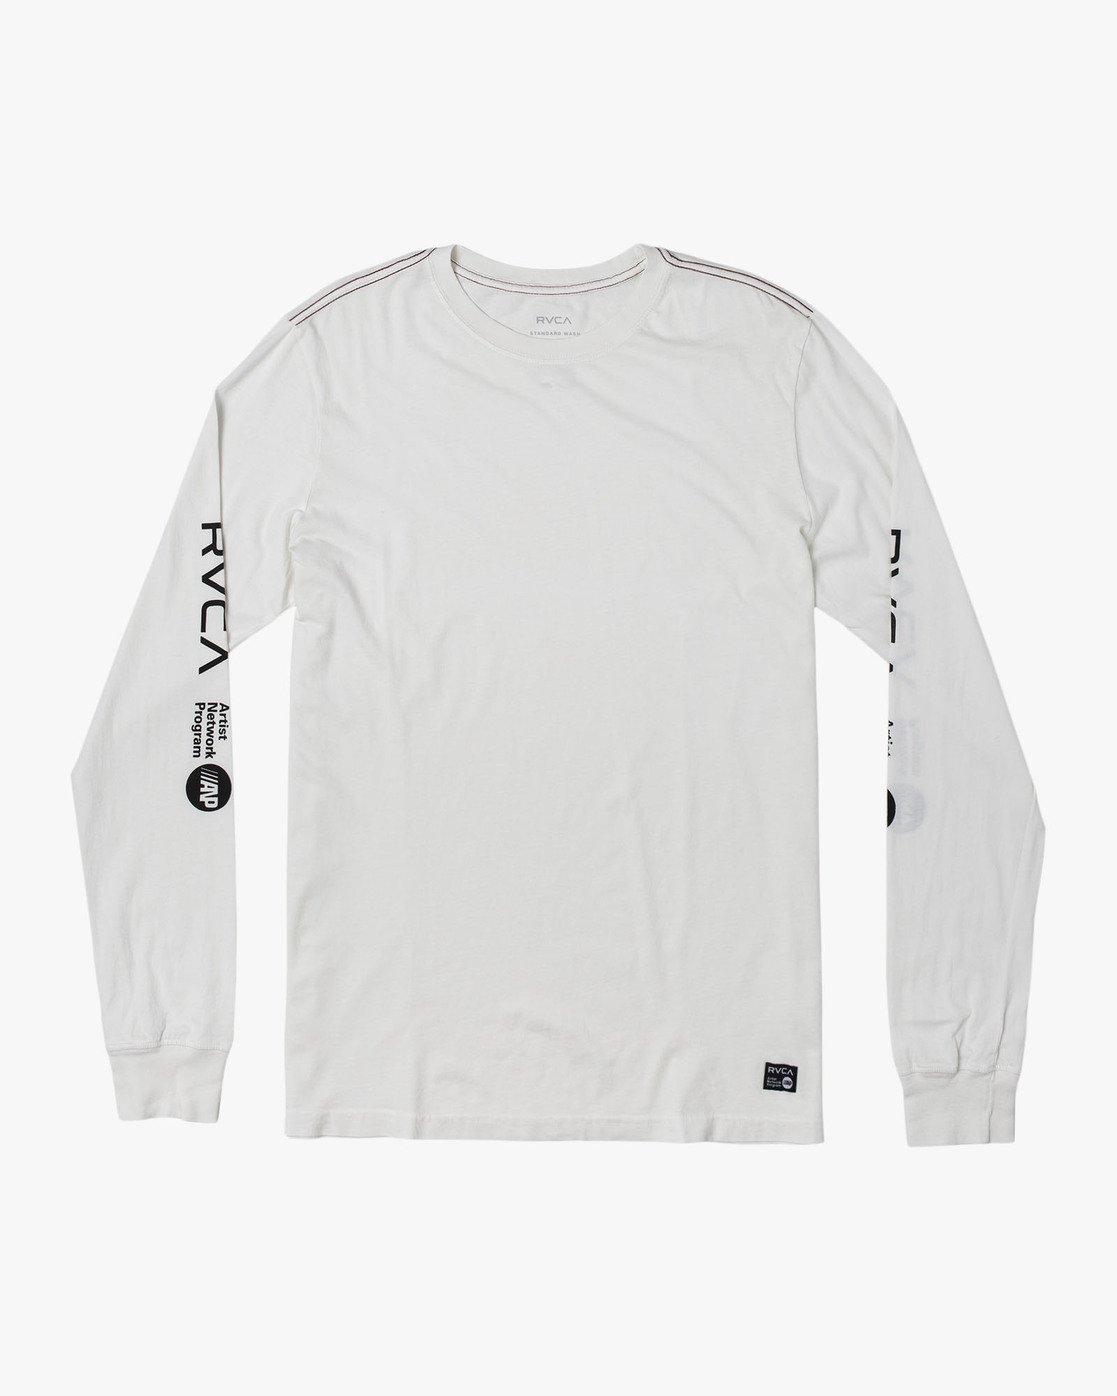 0 ANP Long Sleeve T-Shirt White M463WRAN RVCA